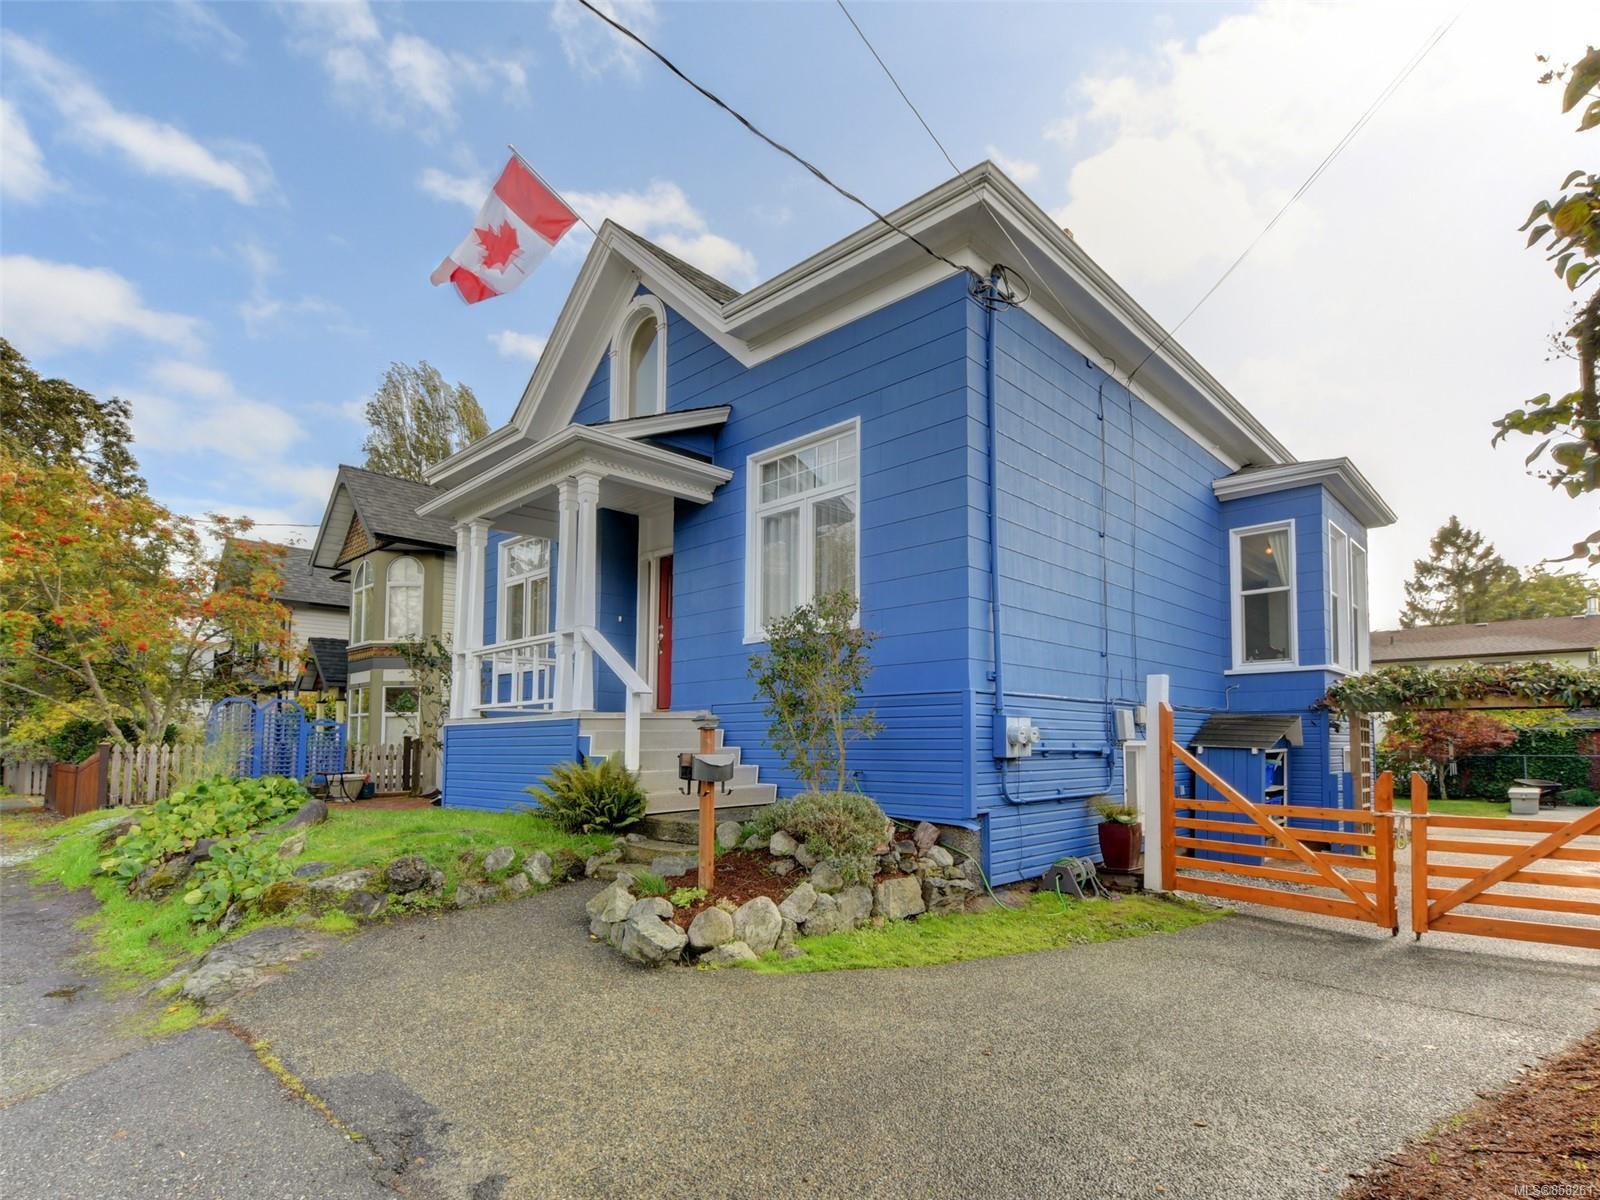 Main Photo: 1149 Grant St in : Vi Fernwood House for sale (Victoria)  : MLS®# 858261